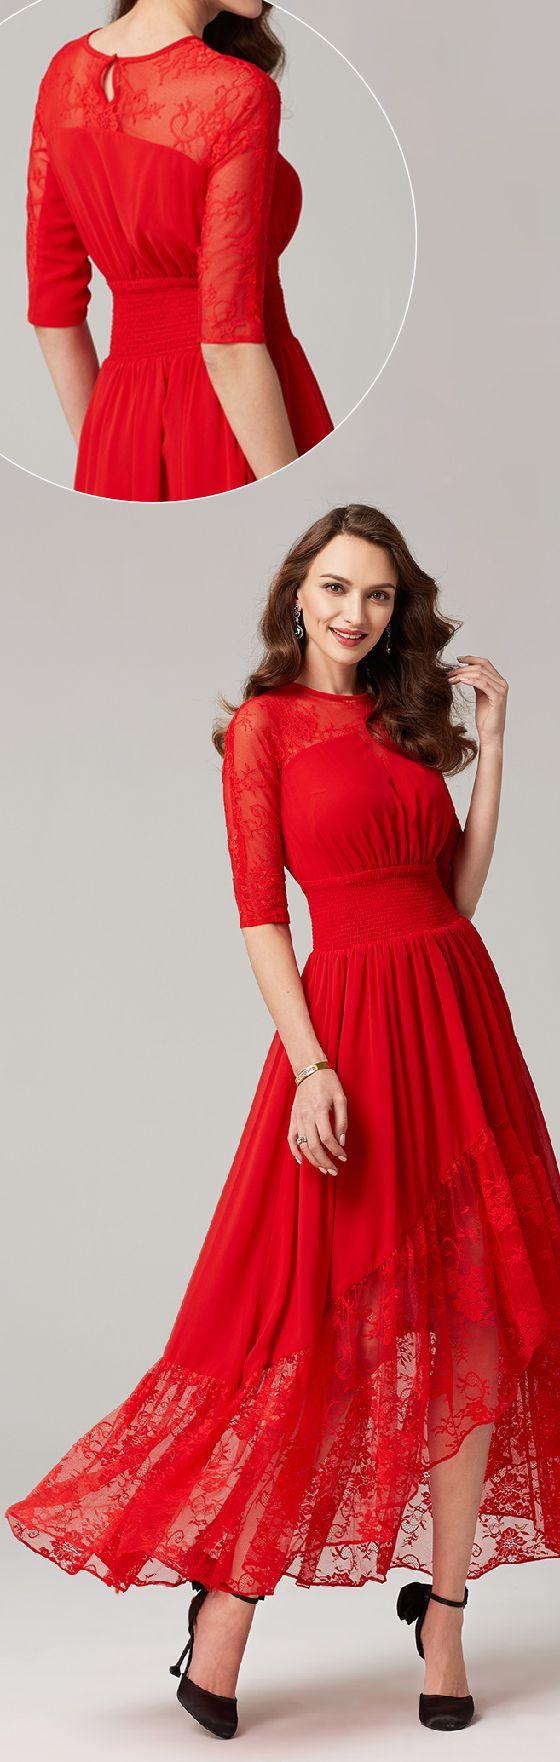 A-Line Illusion Neckline Asymmetrical Chiffon Lace Formal Evening Dress with Lace Sash / Ribbon Pleats